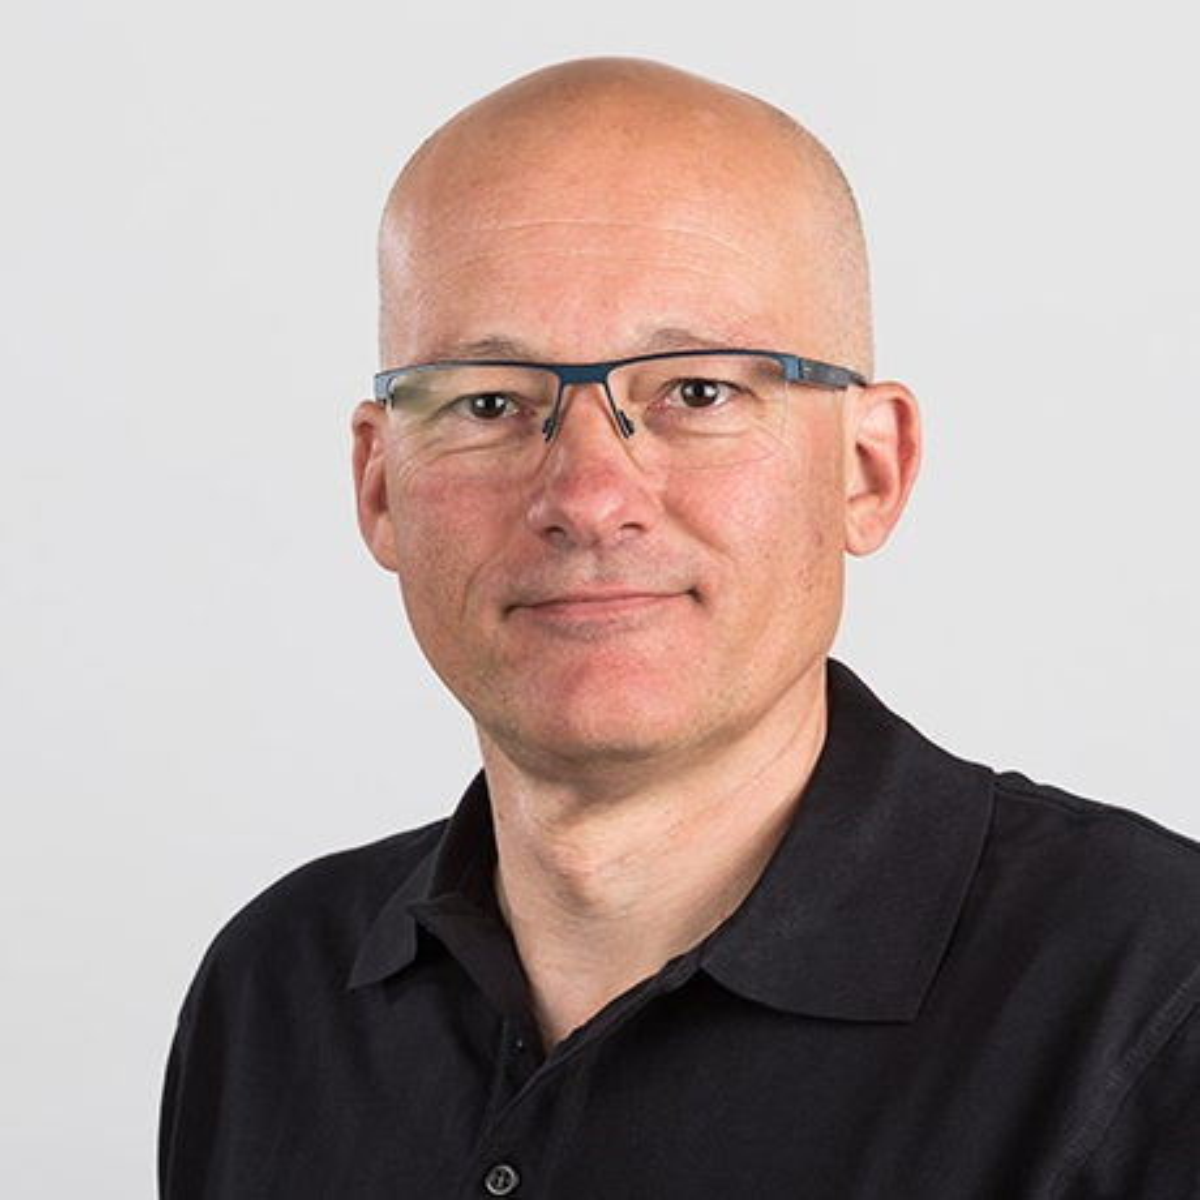 Stéphane Ropraz